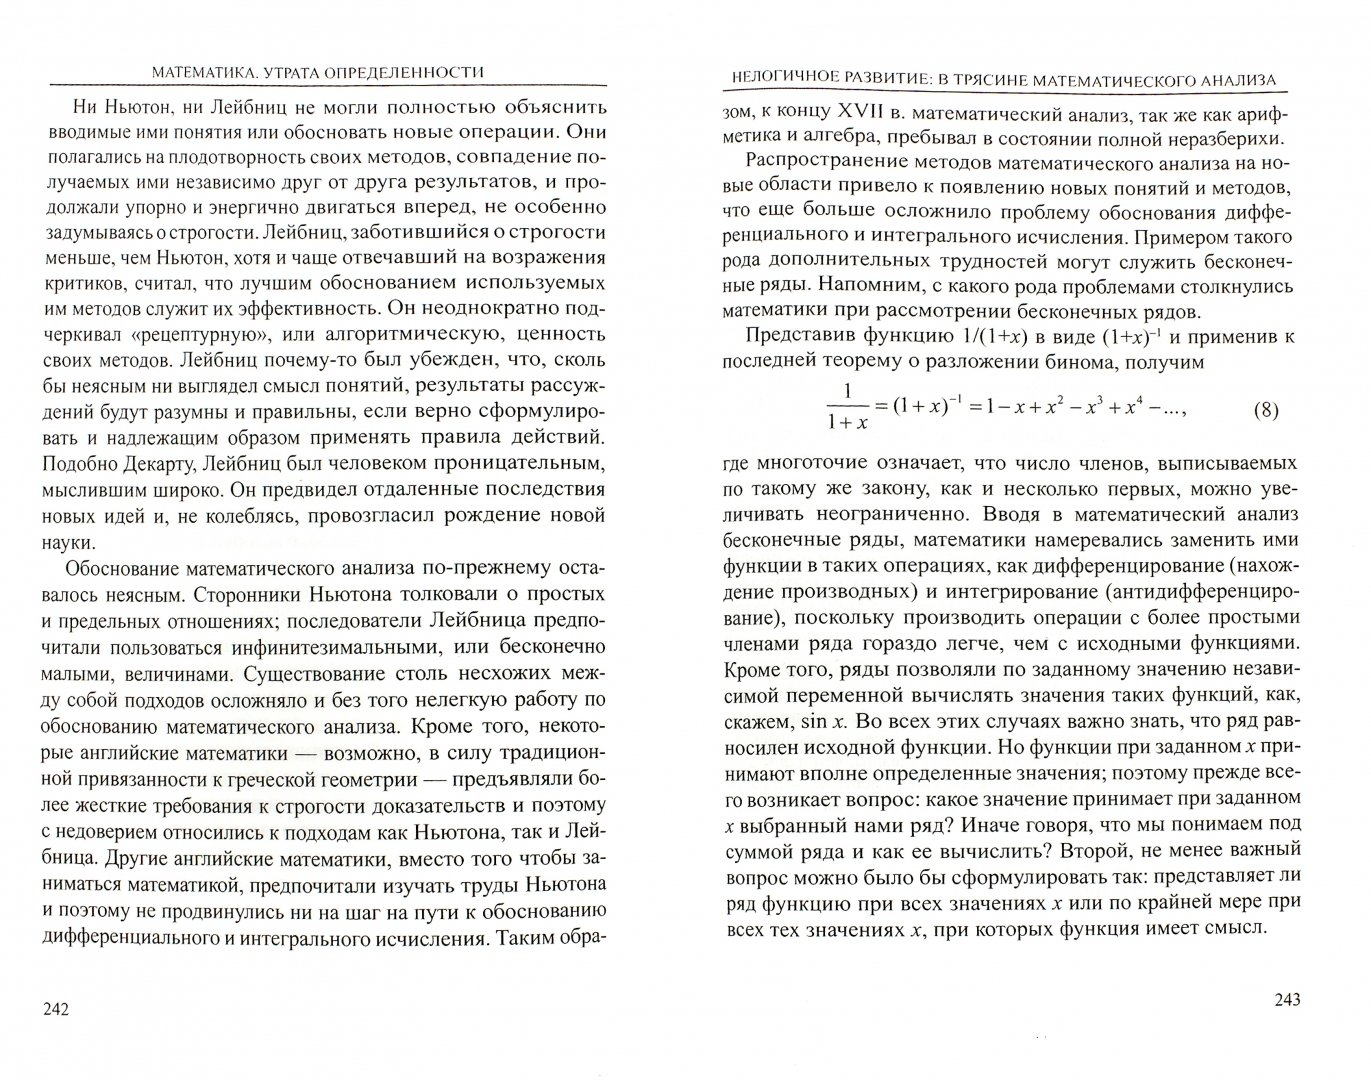 Иллюстрация 1 из 21 для Математика. Утрата определенности - Морис Клайн   Лабиринт - книги. Источник: Лабиринт